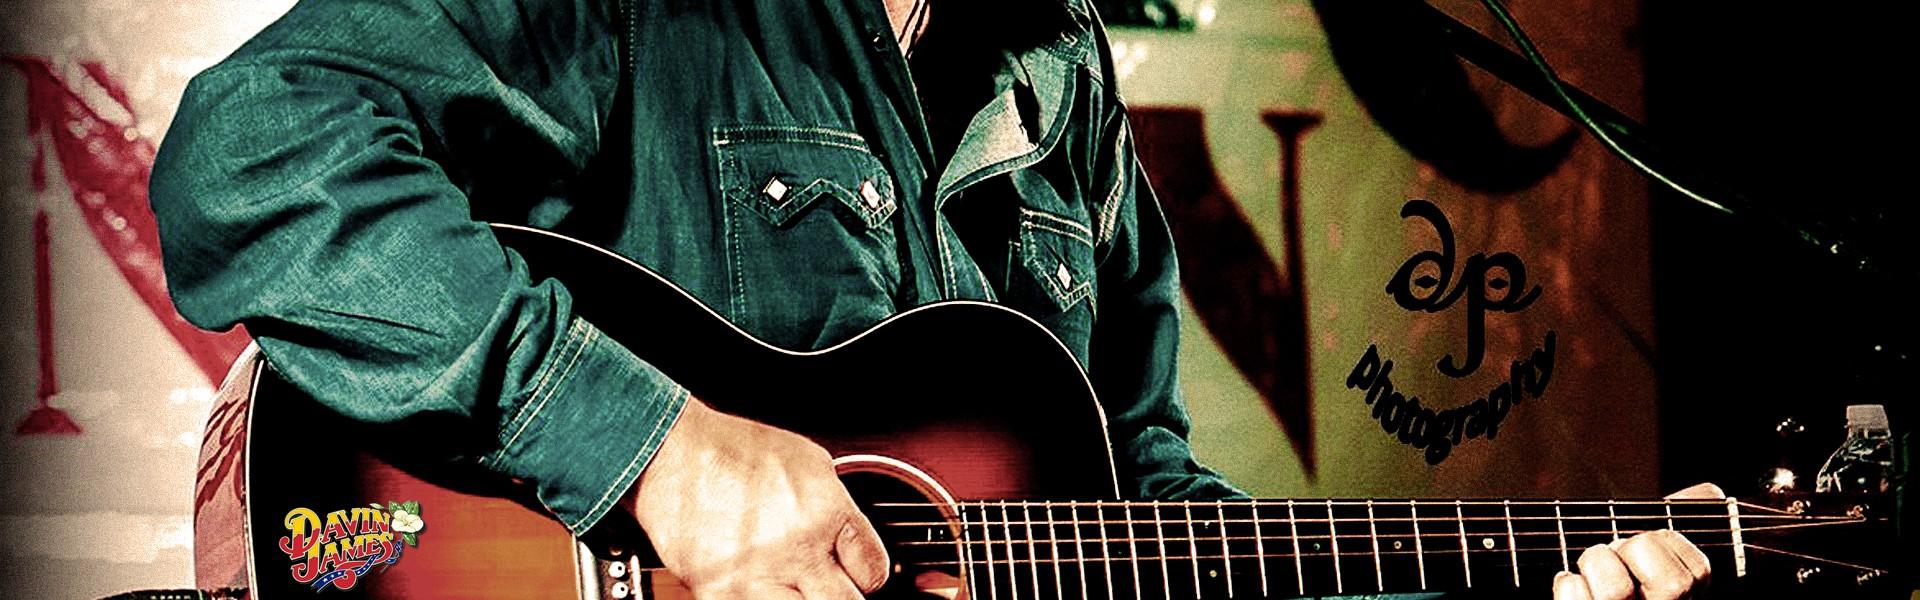 Davin James Acoustic Performance